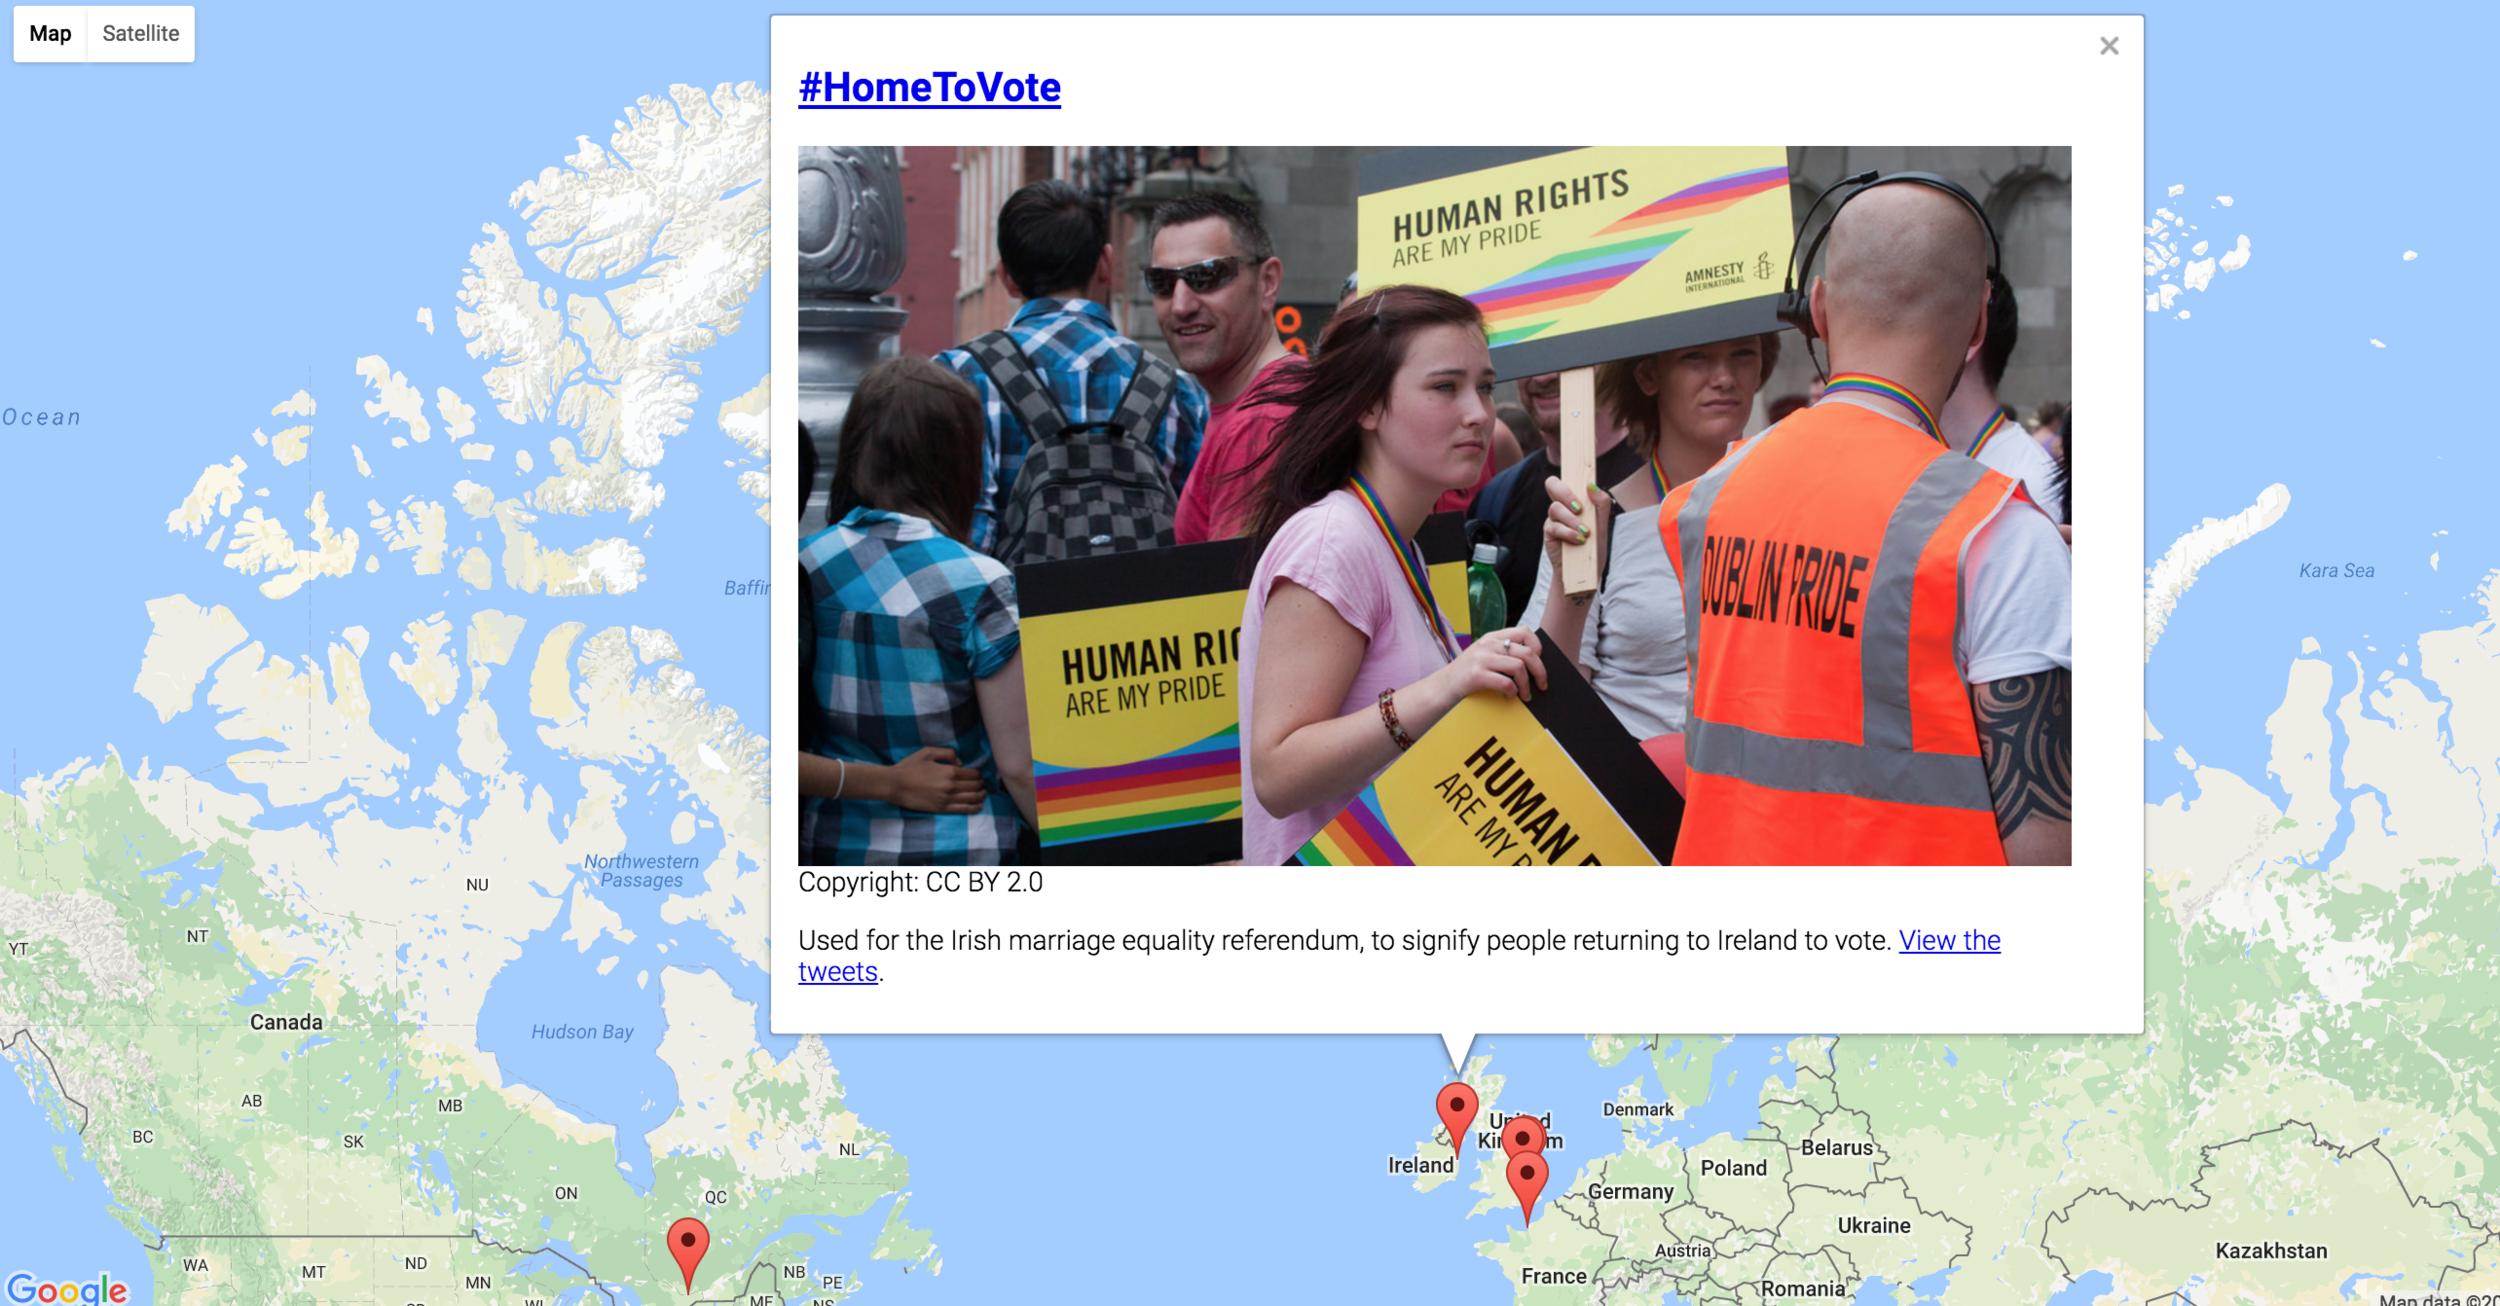 Interactive hashtage map